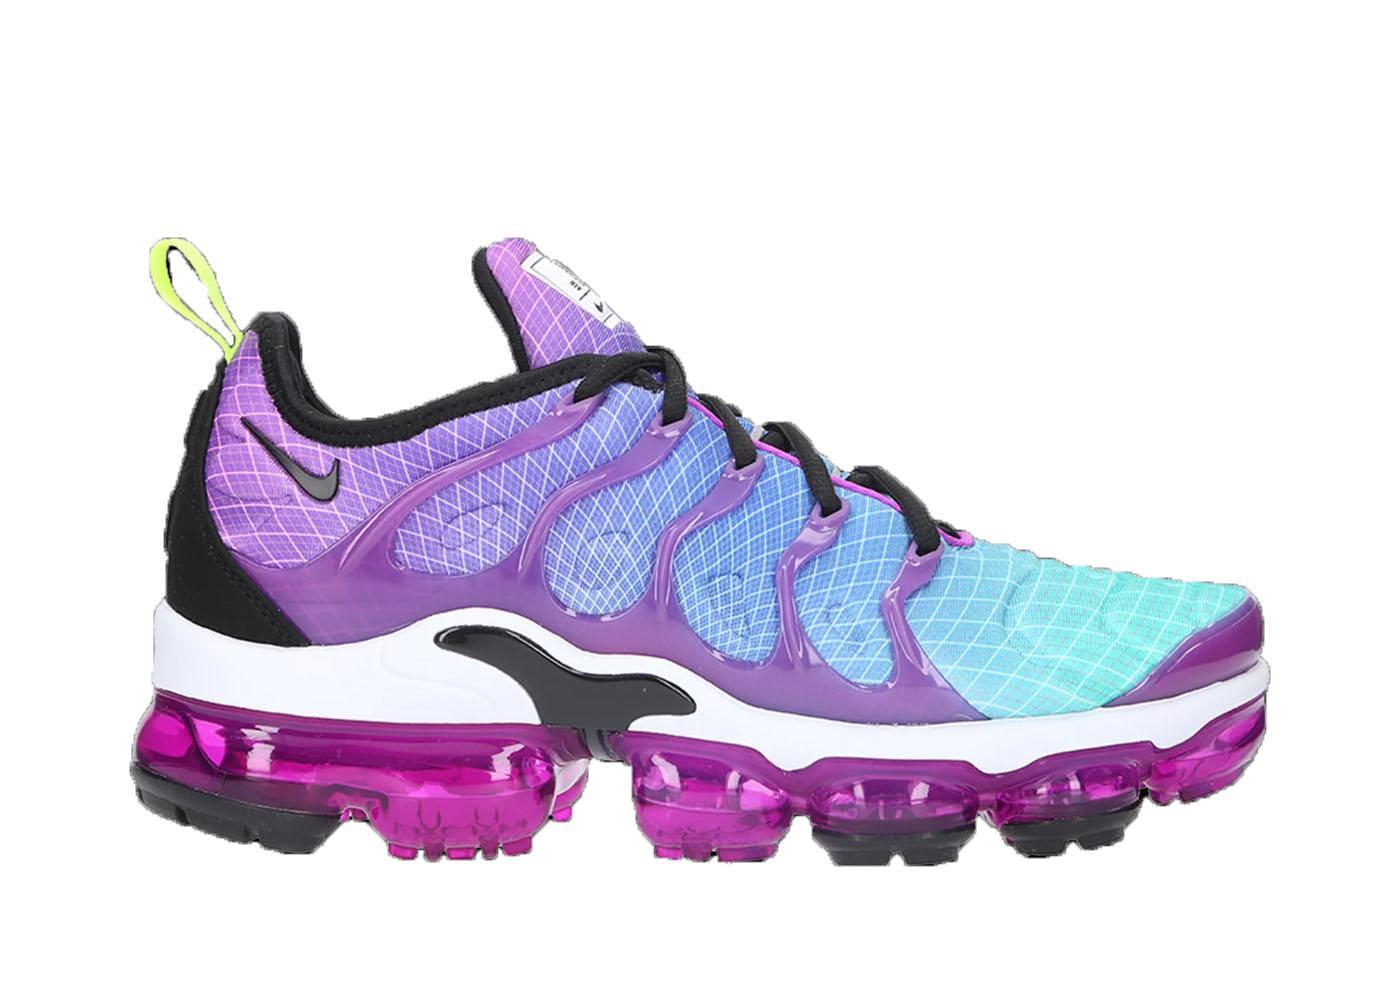 nike air vapormax plus women's purple